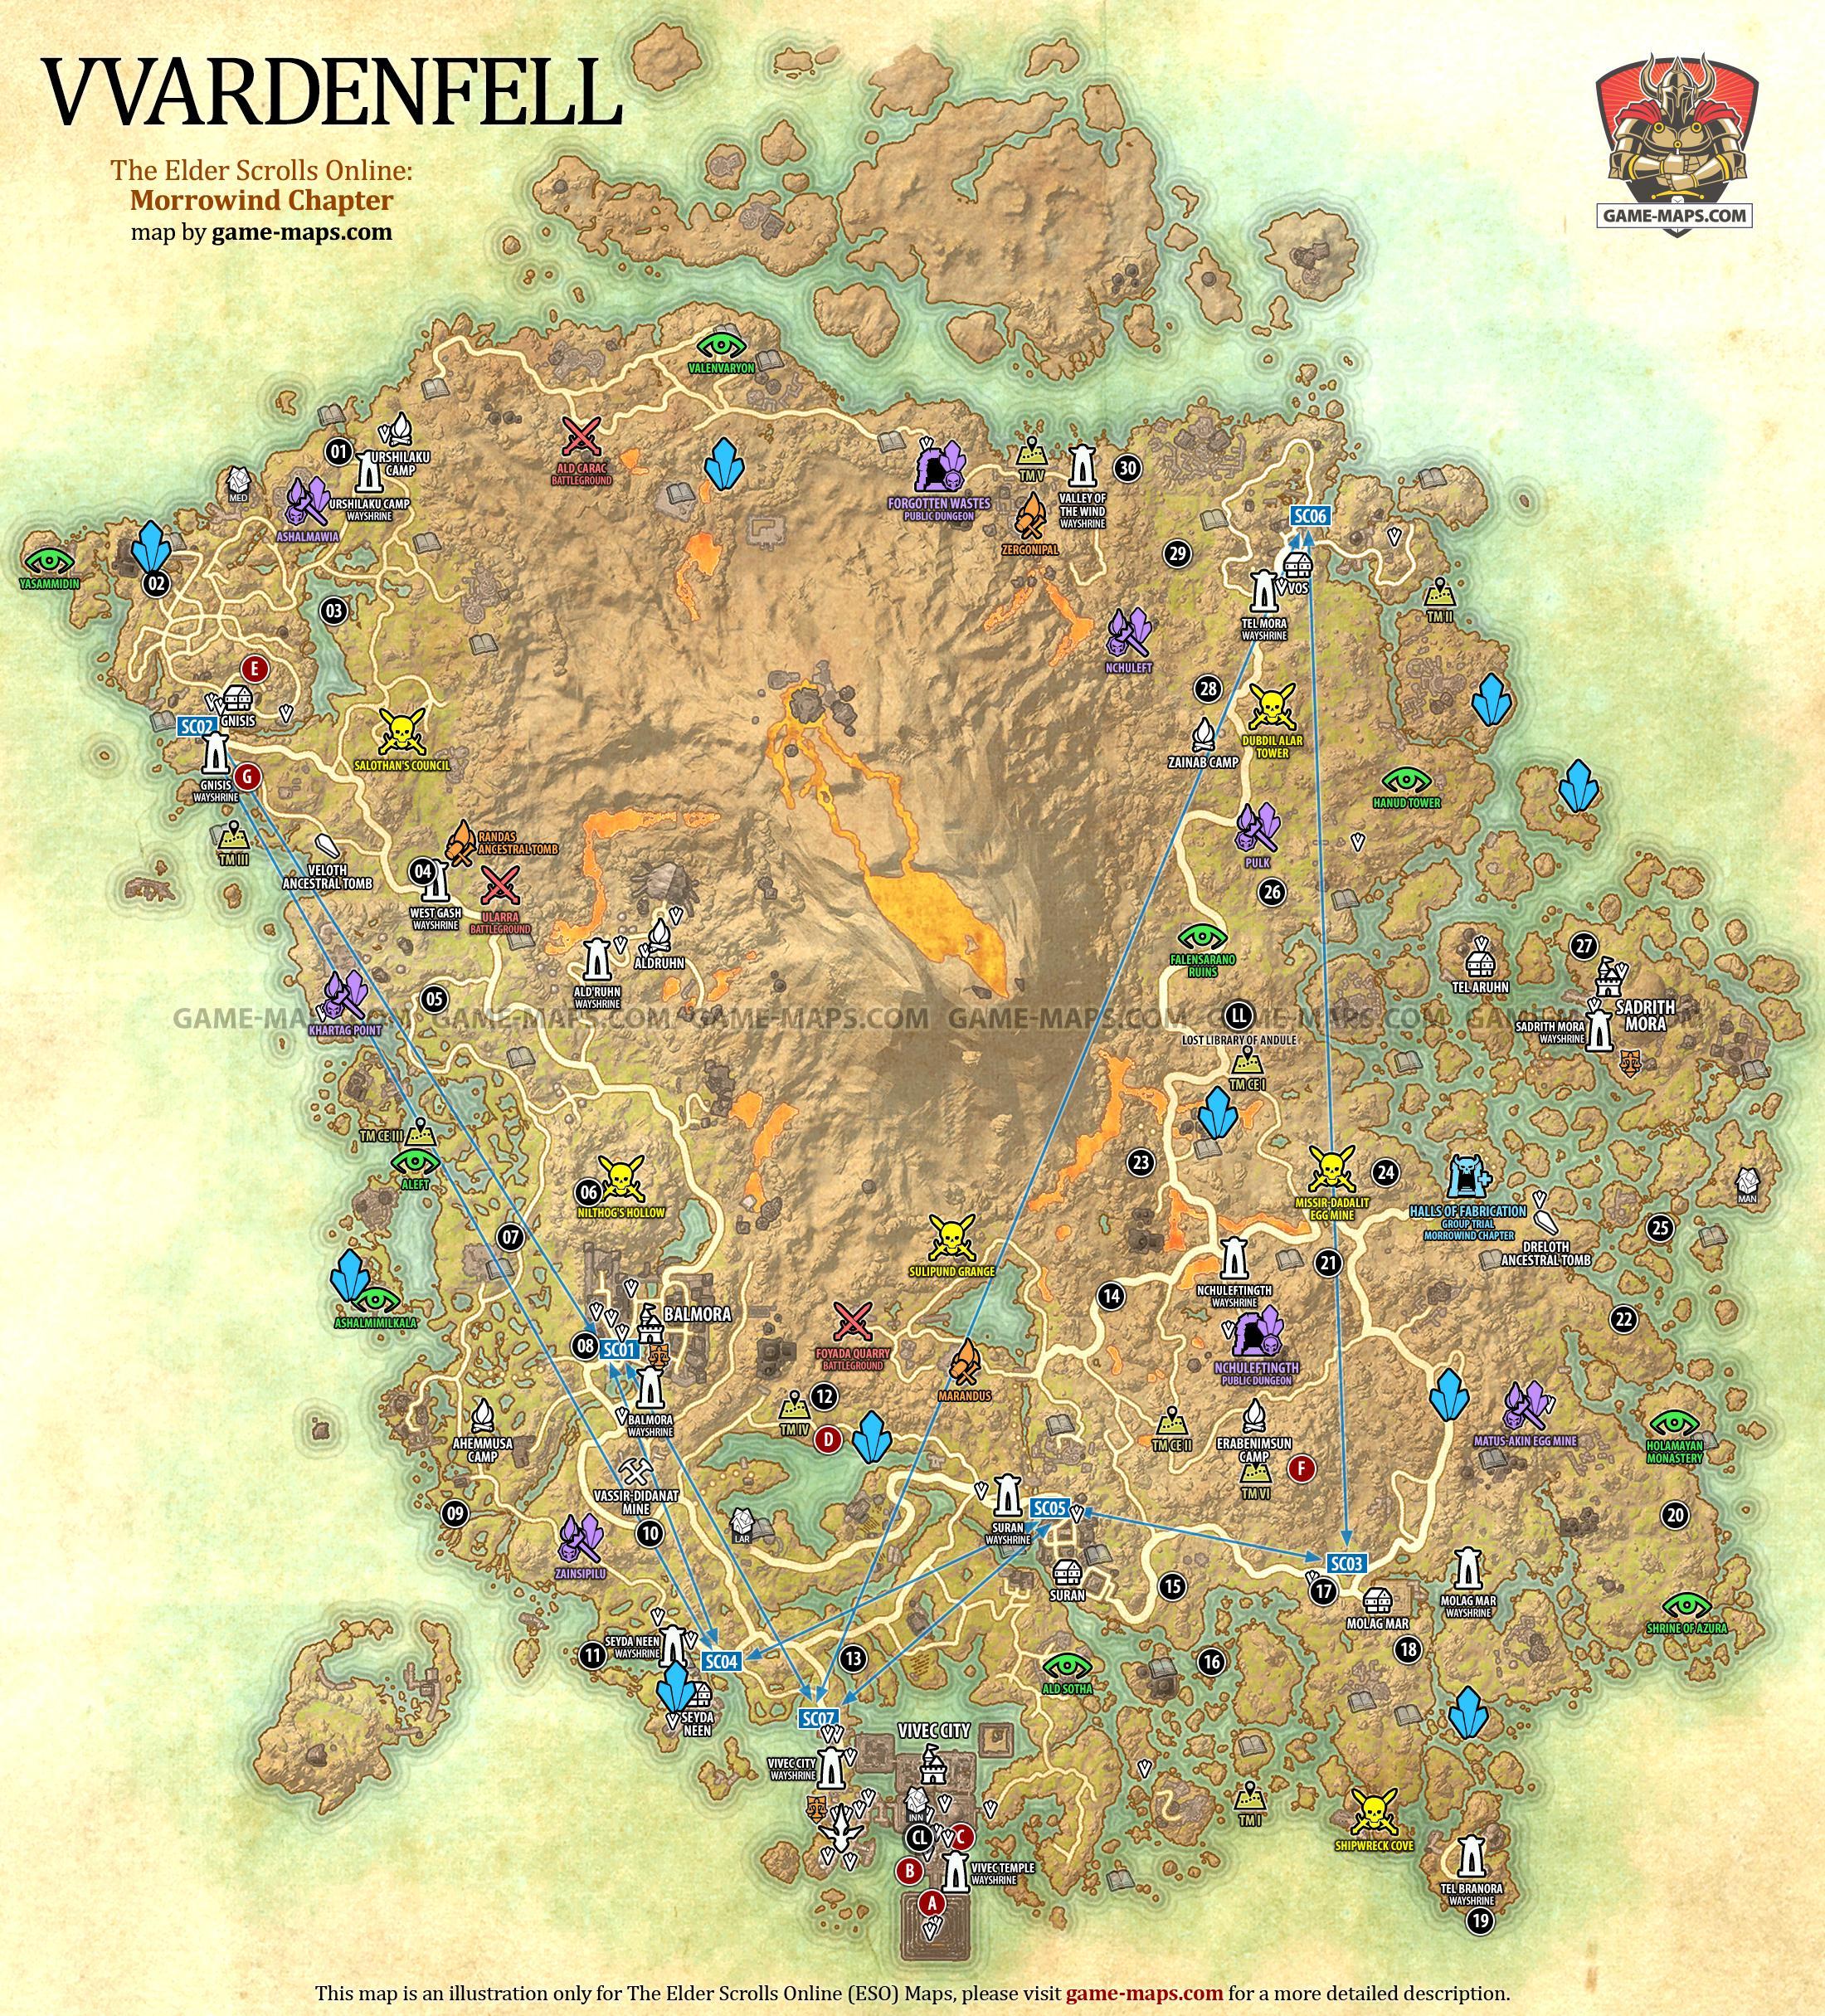 Eso Auridon Treasure Map 5 : auridon, treasure, Vvardenfell, Elder, Scrolls, Online:, Morrowind, Game-maps.com